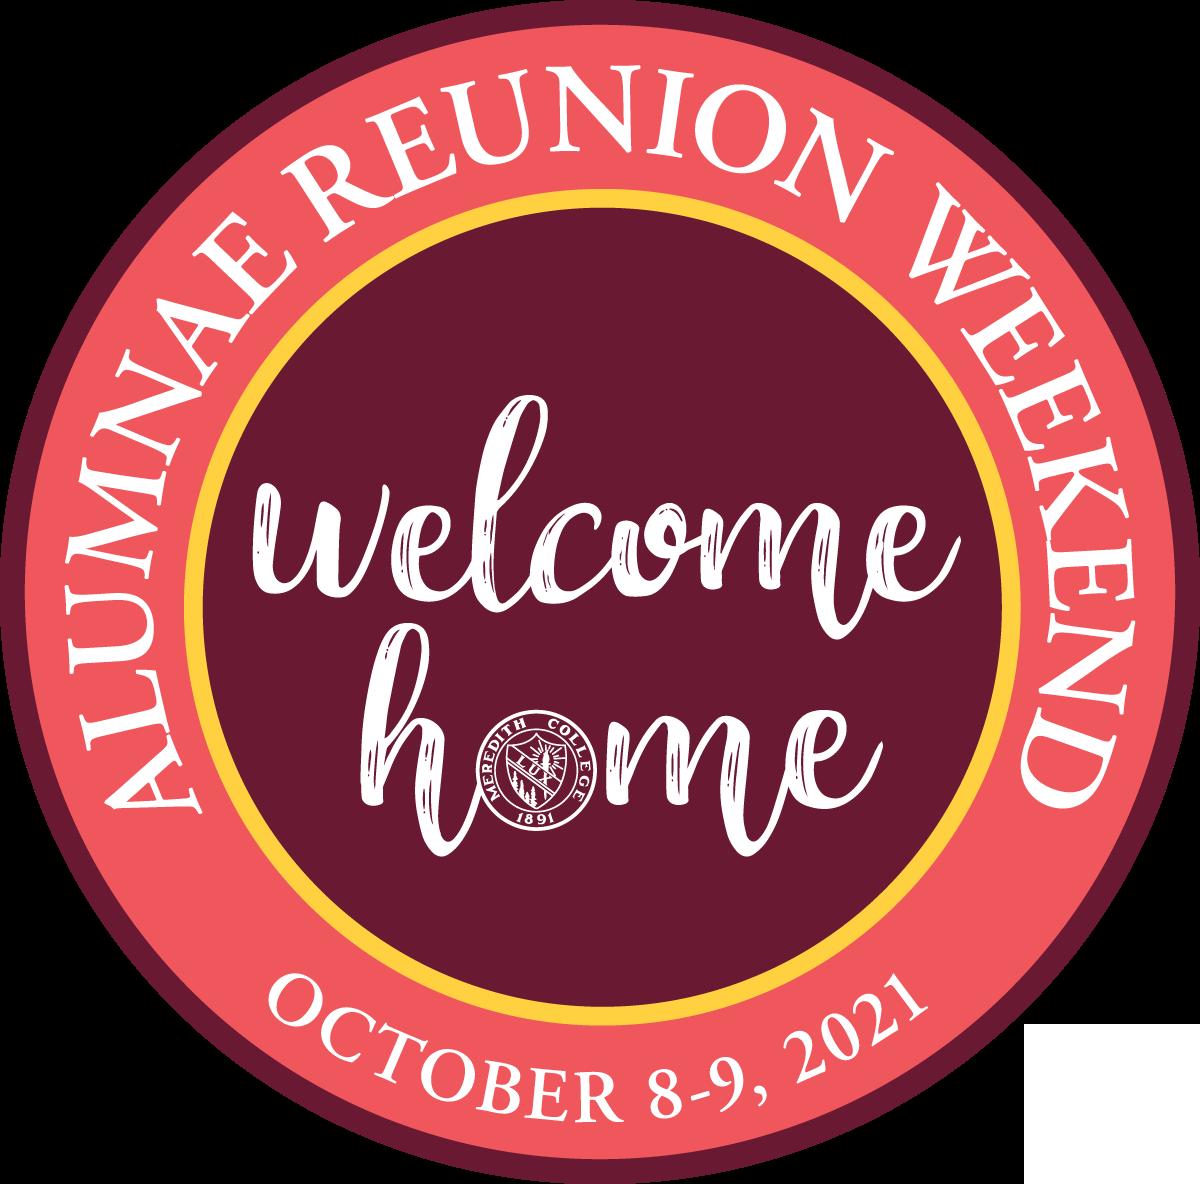 Alumnae Reunion Weekend October 8-9, 2021